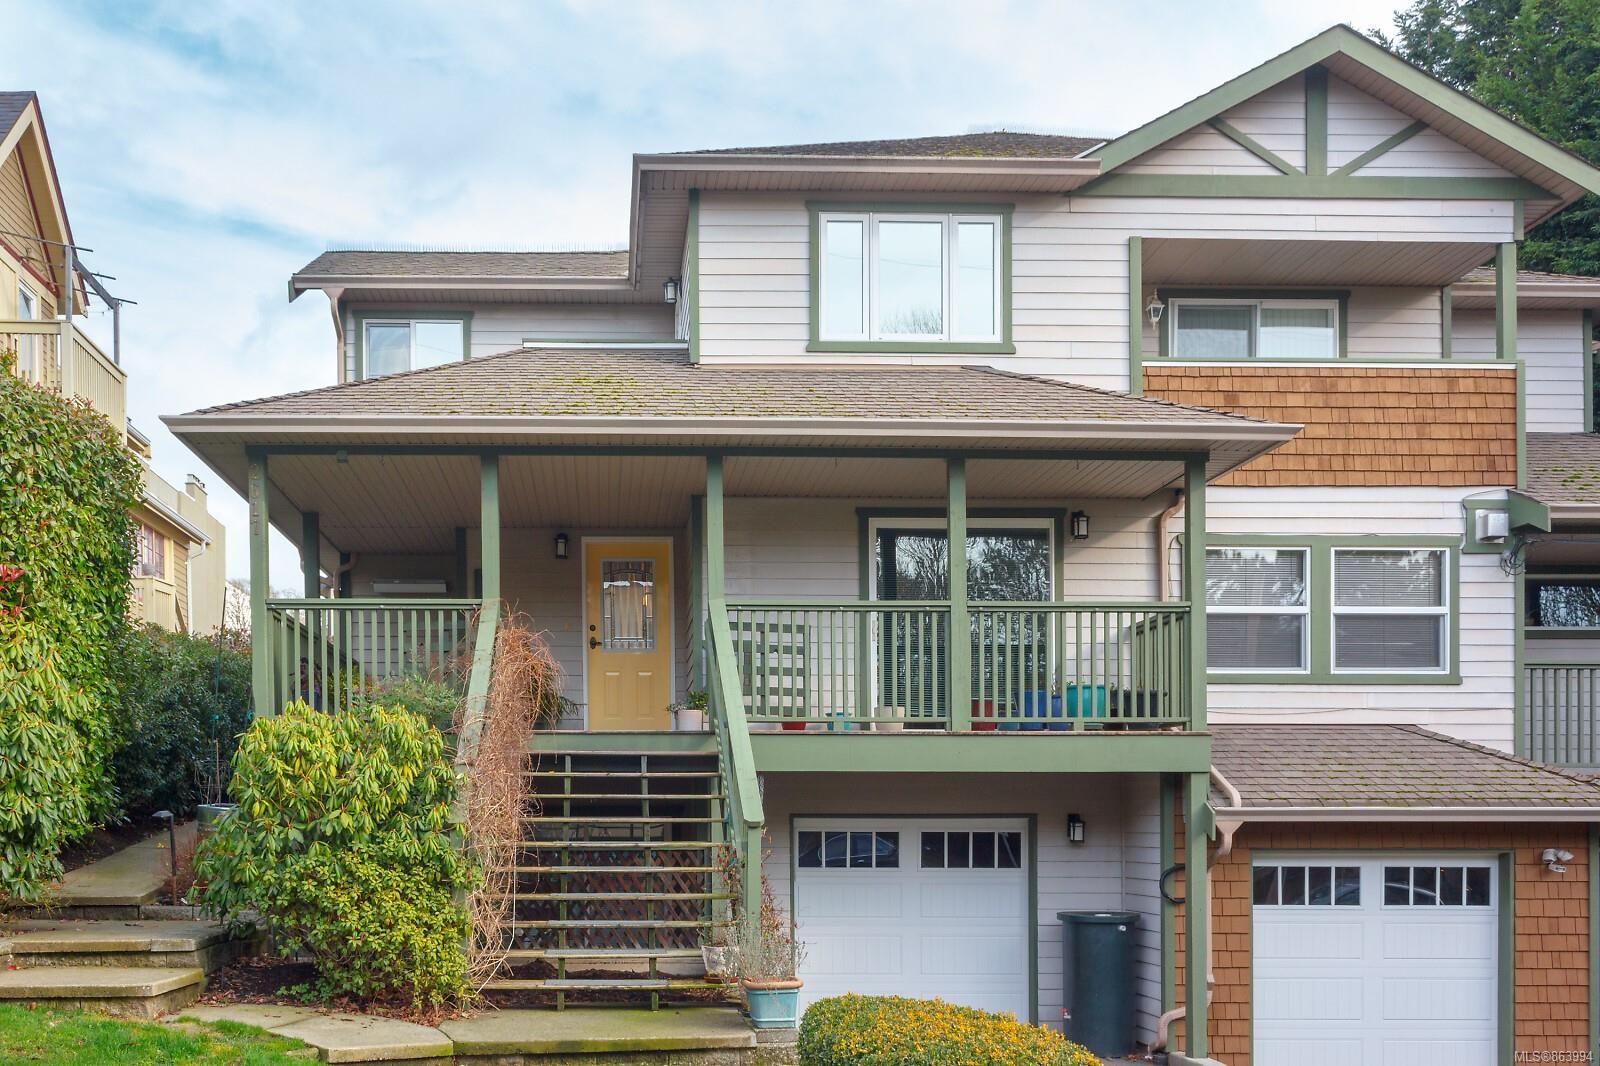 Main Photo: 2617 Prior St in : Vi Hillside Row/Townhouse for sale (Victoria)  : MLS®# 863994